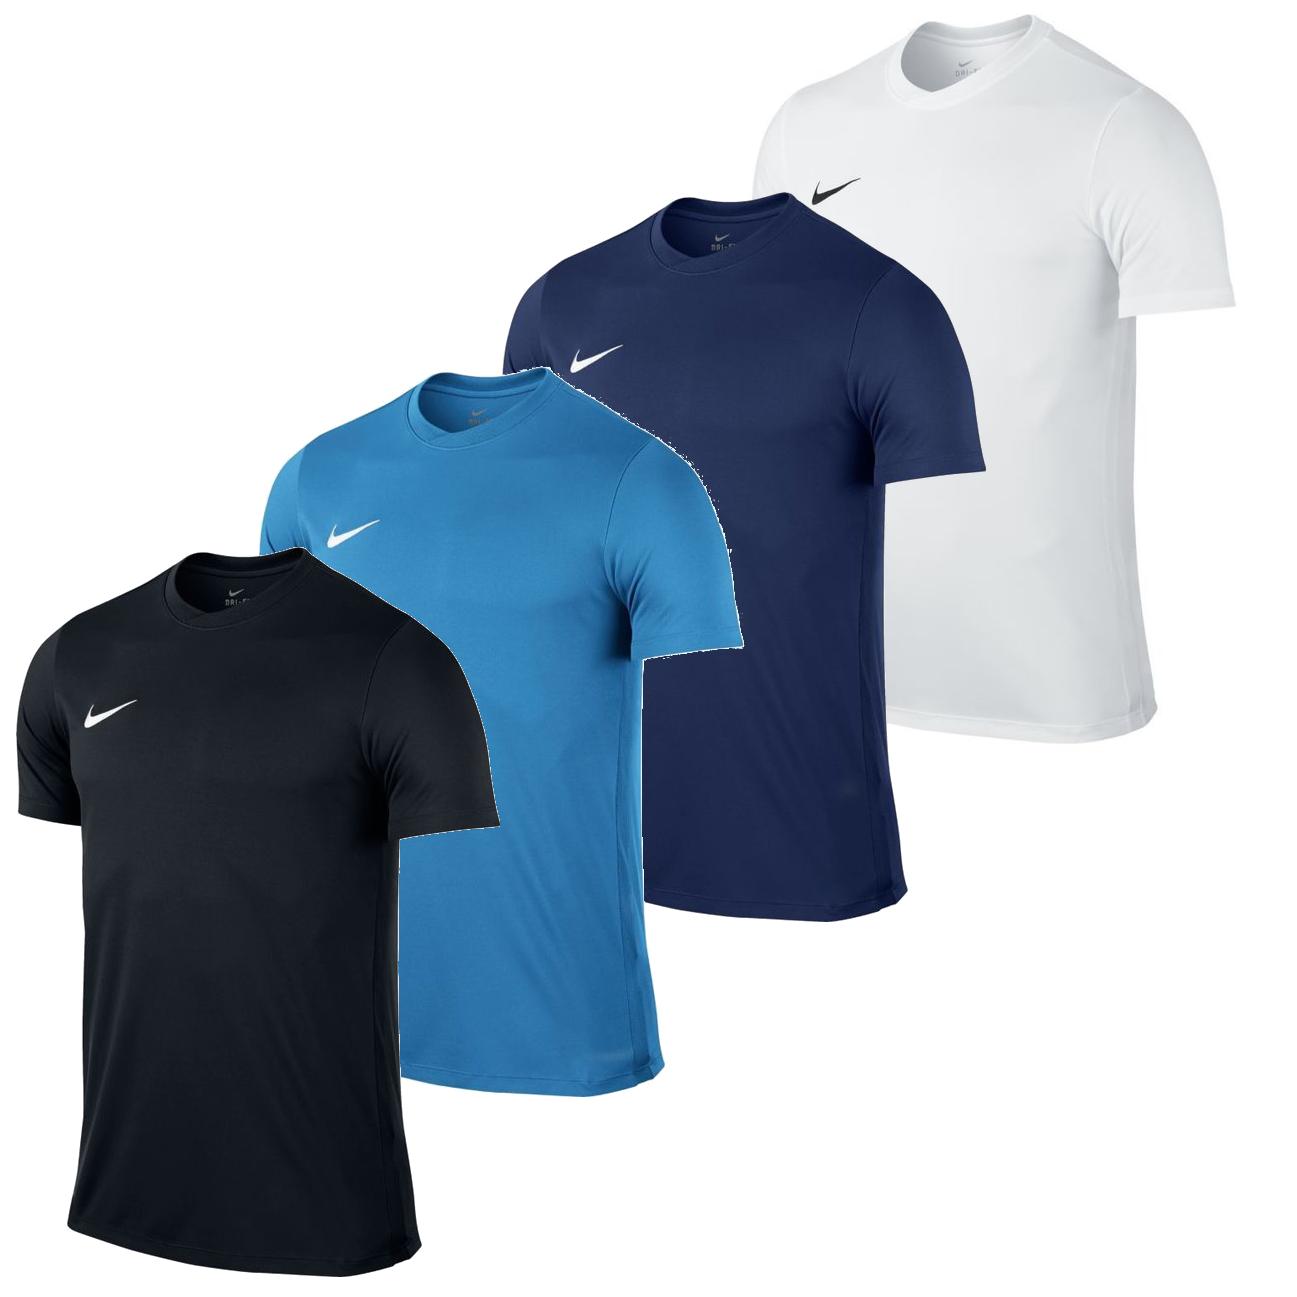 Nike Park VI Dri-FIT Herren Trikot T-Shirt Training Fußball Fitness 725891